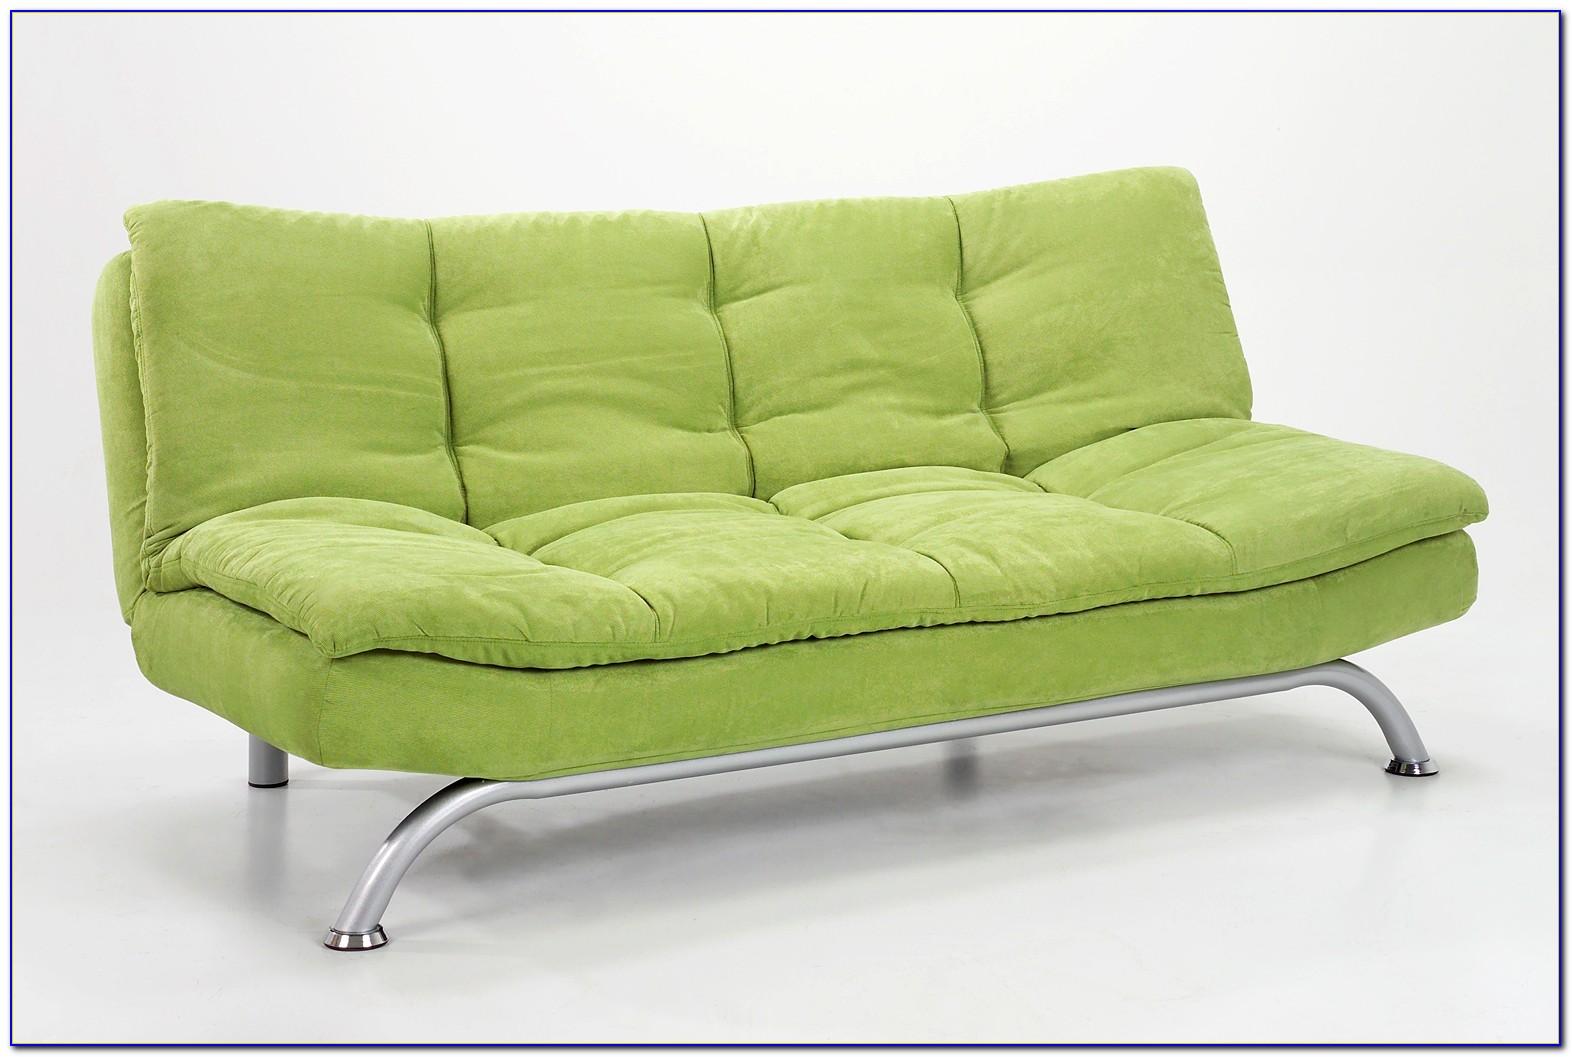 Ikea Möbel Liefern Lassen Schweiz